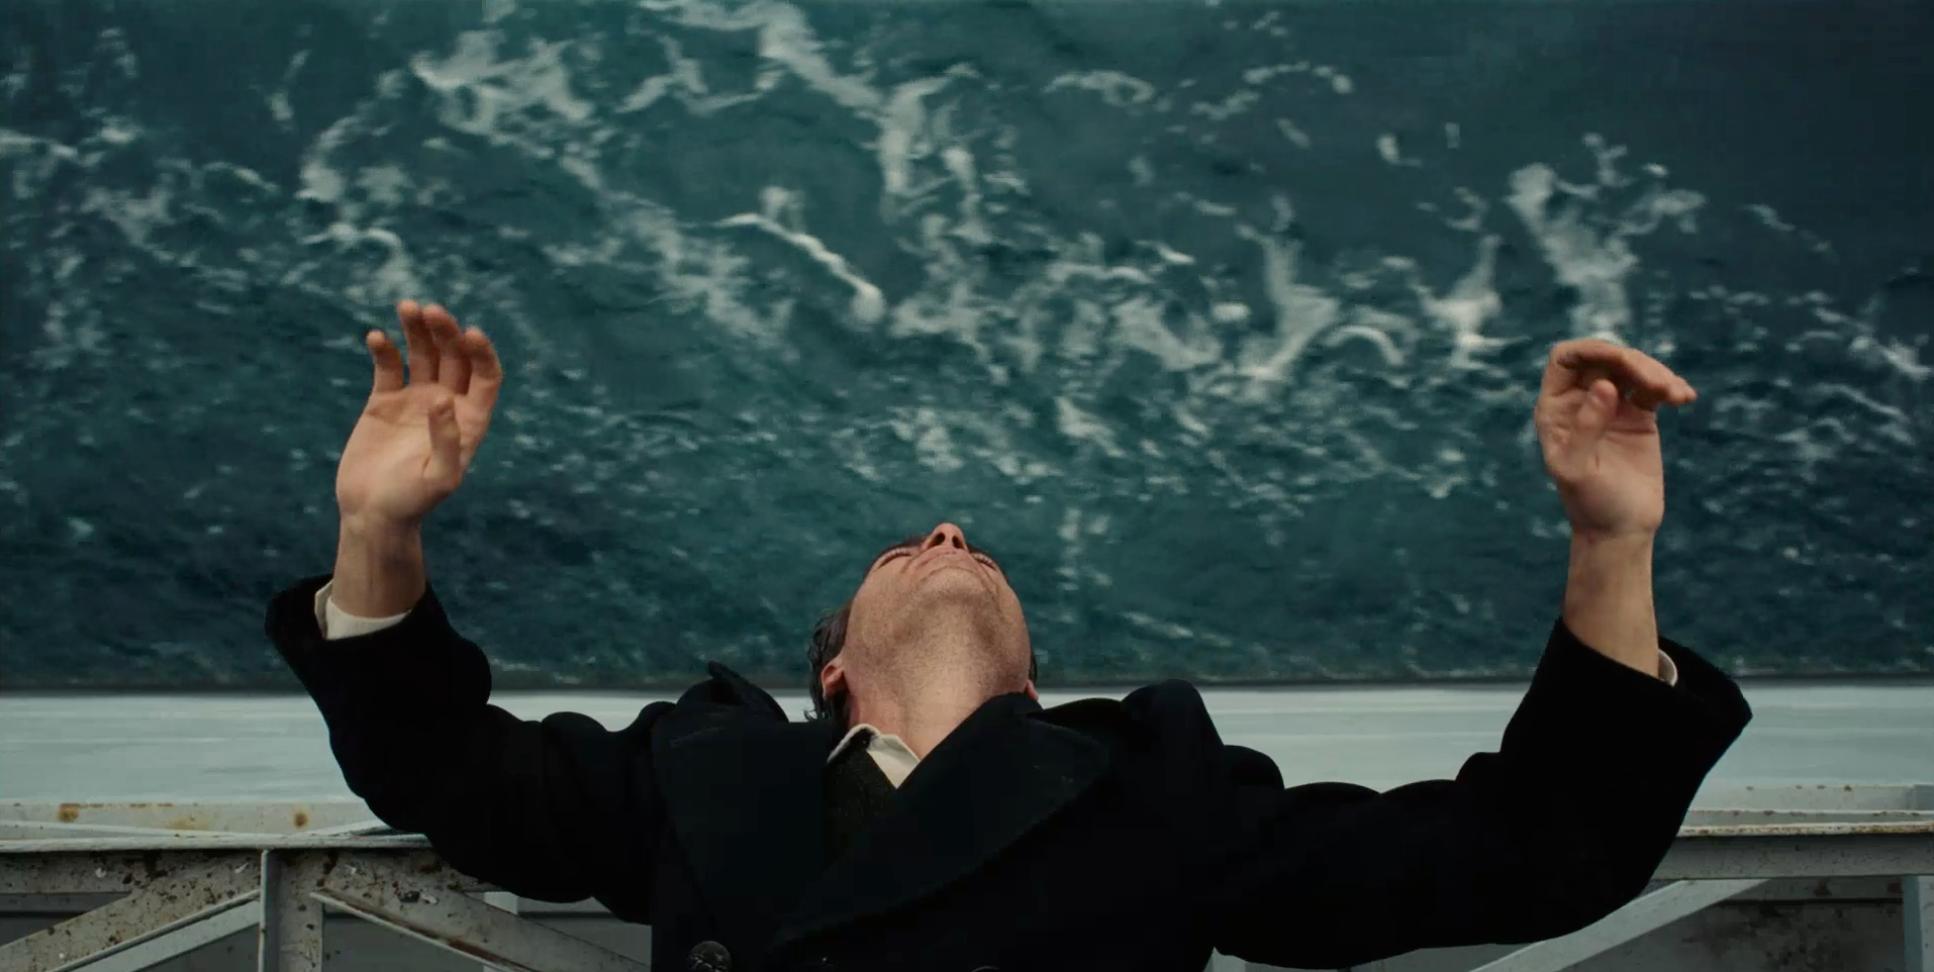 the master 1 - نقد فیلم The Master (مرشد) محصول 2012 | یک معمای باشکوه